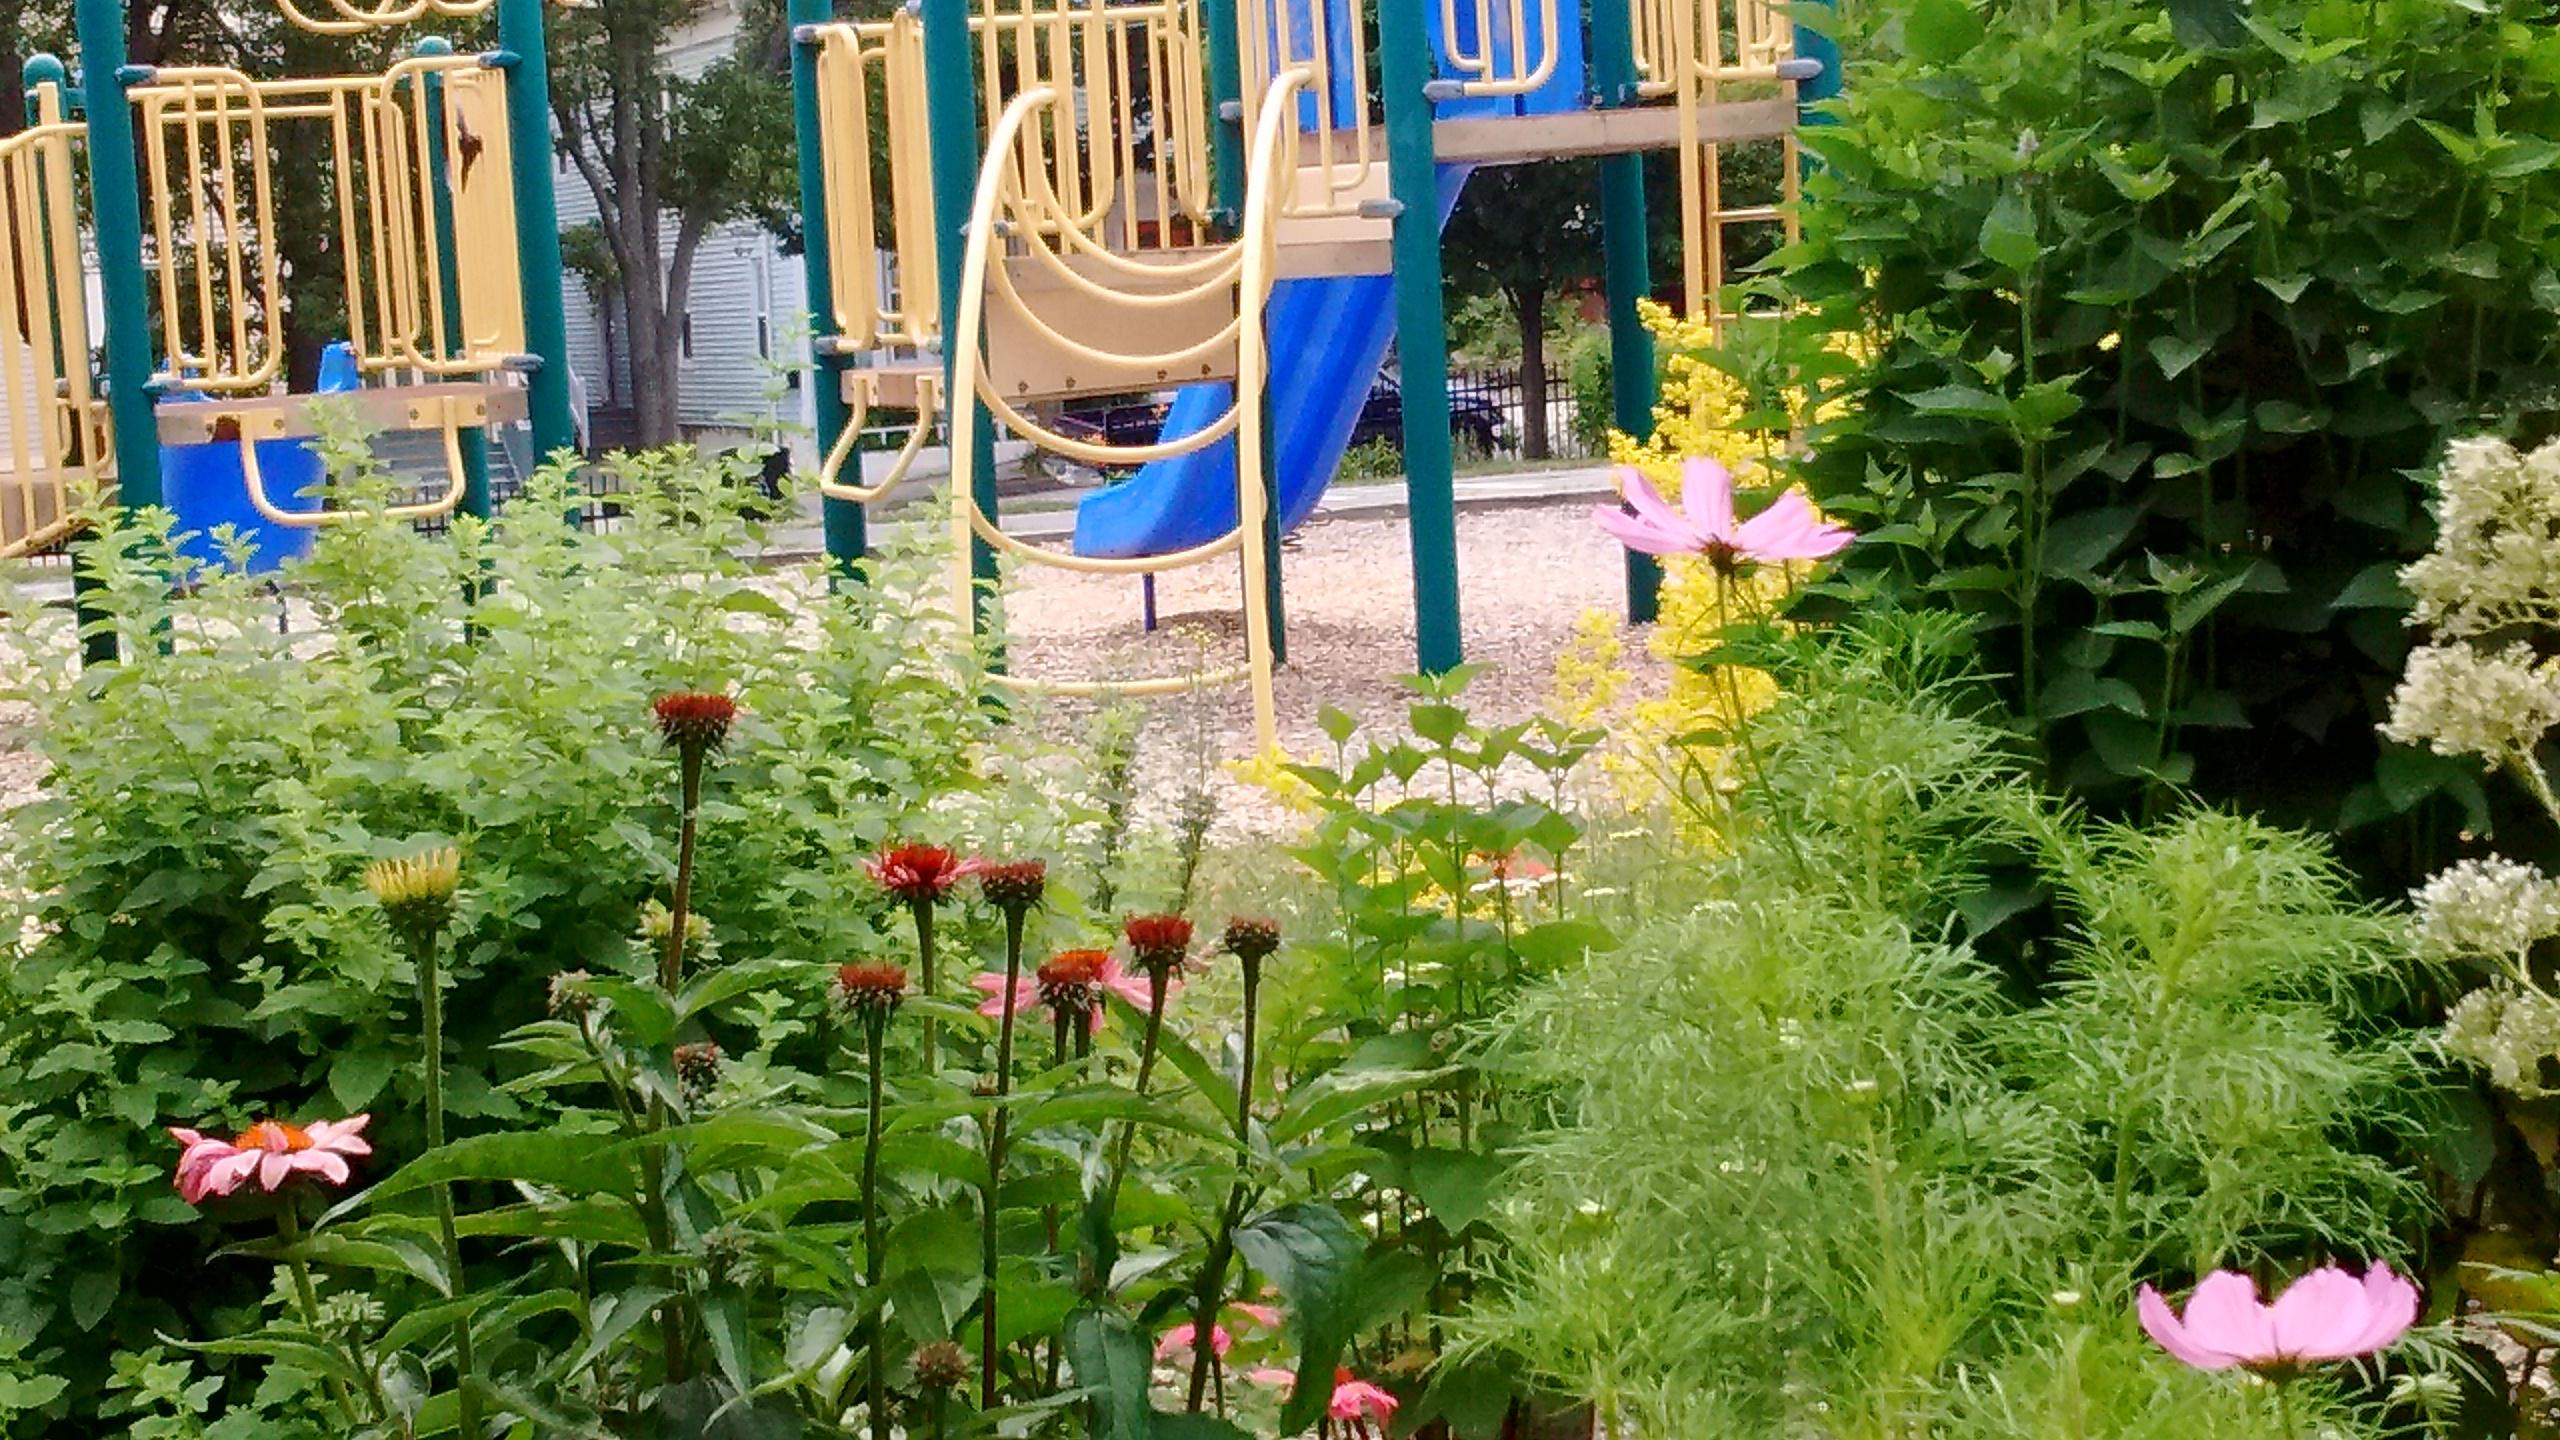 Clark Street Park – Herb Garden